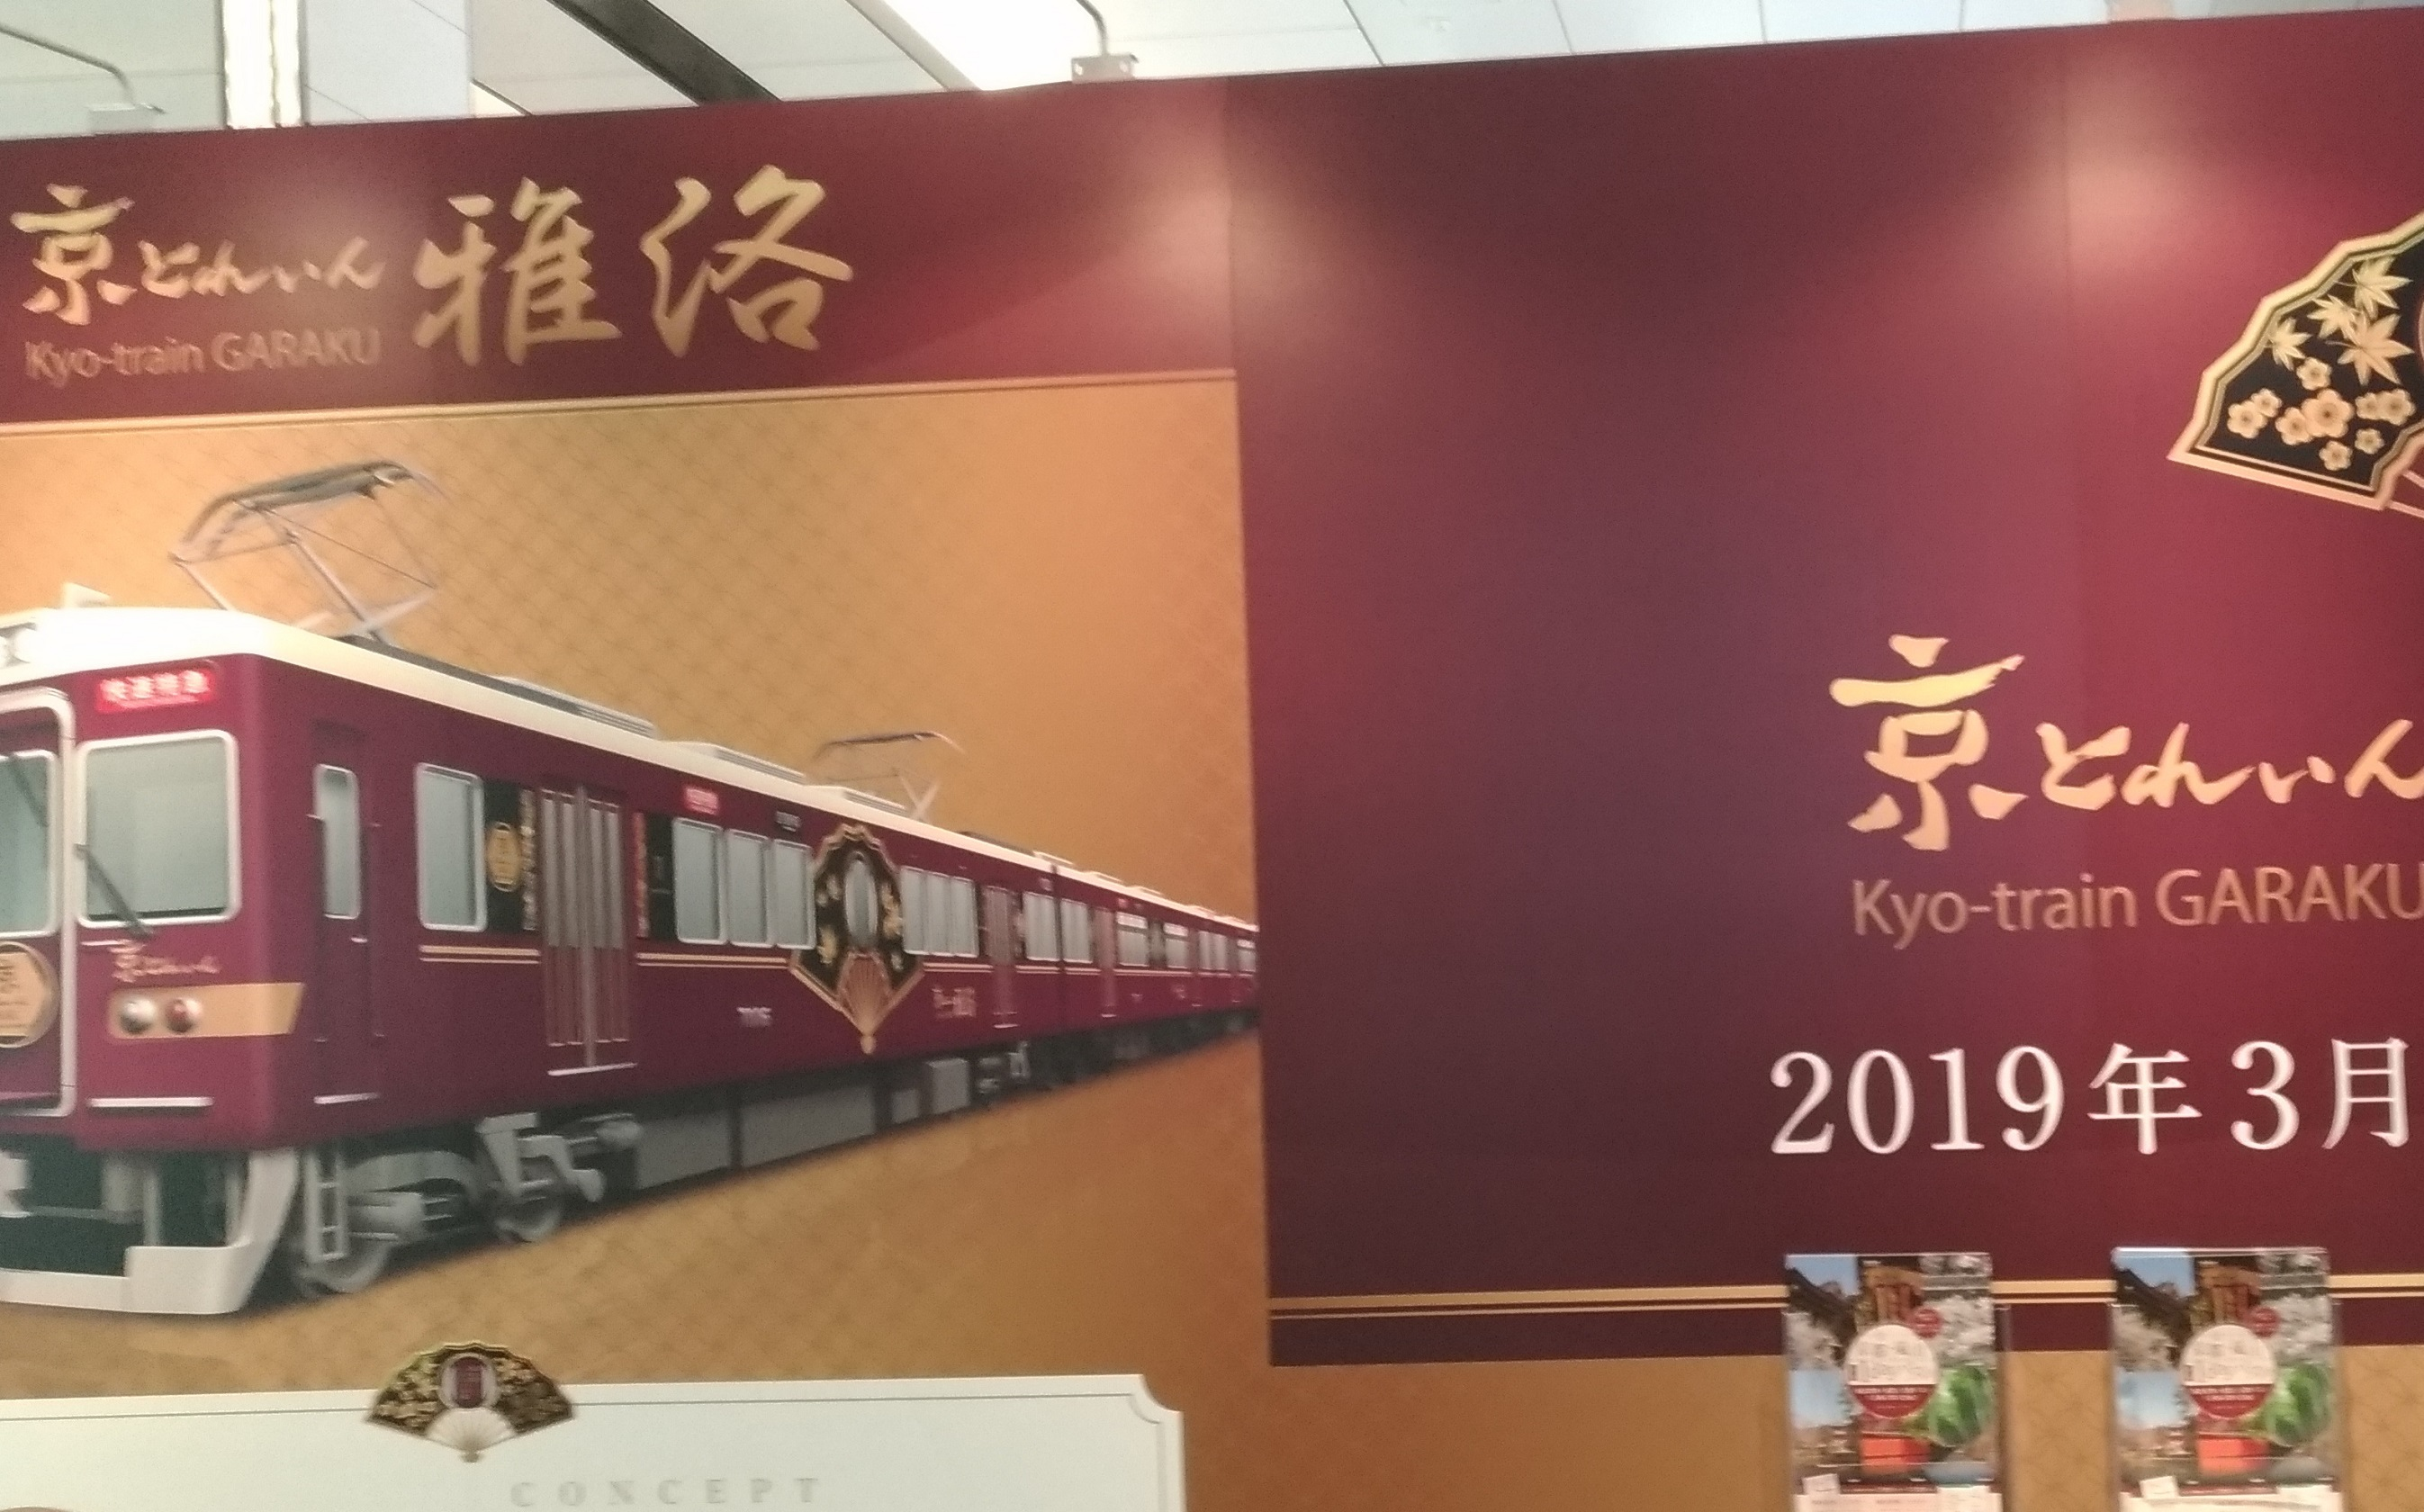 osaka_hankyu_train_kyo_garaku.jpg